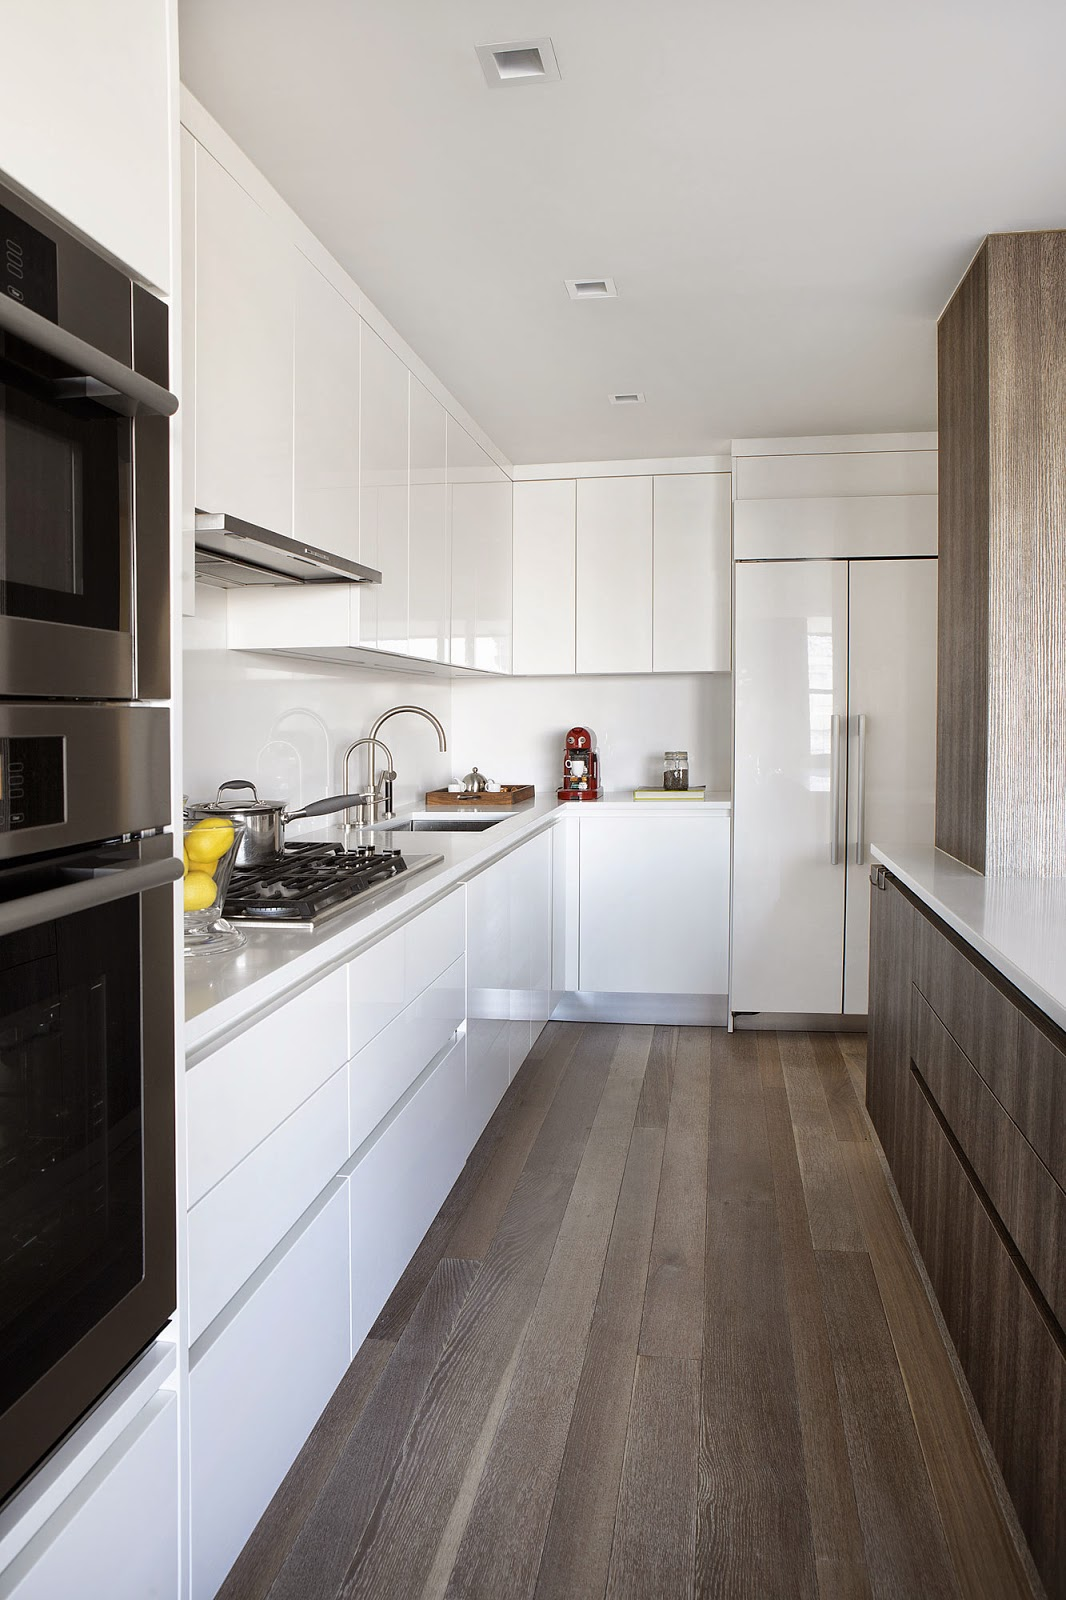 MCKB Custom Minimalist Kitchen By CESAR of Italy - MCK+B